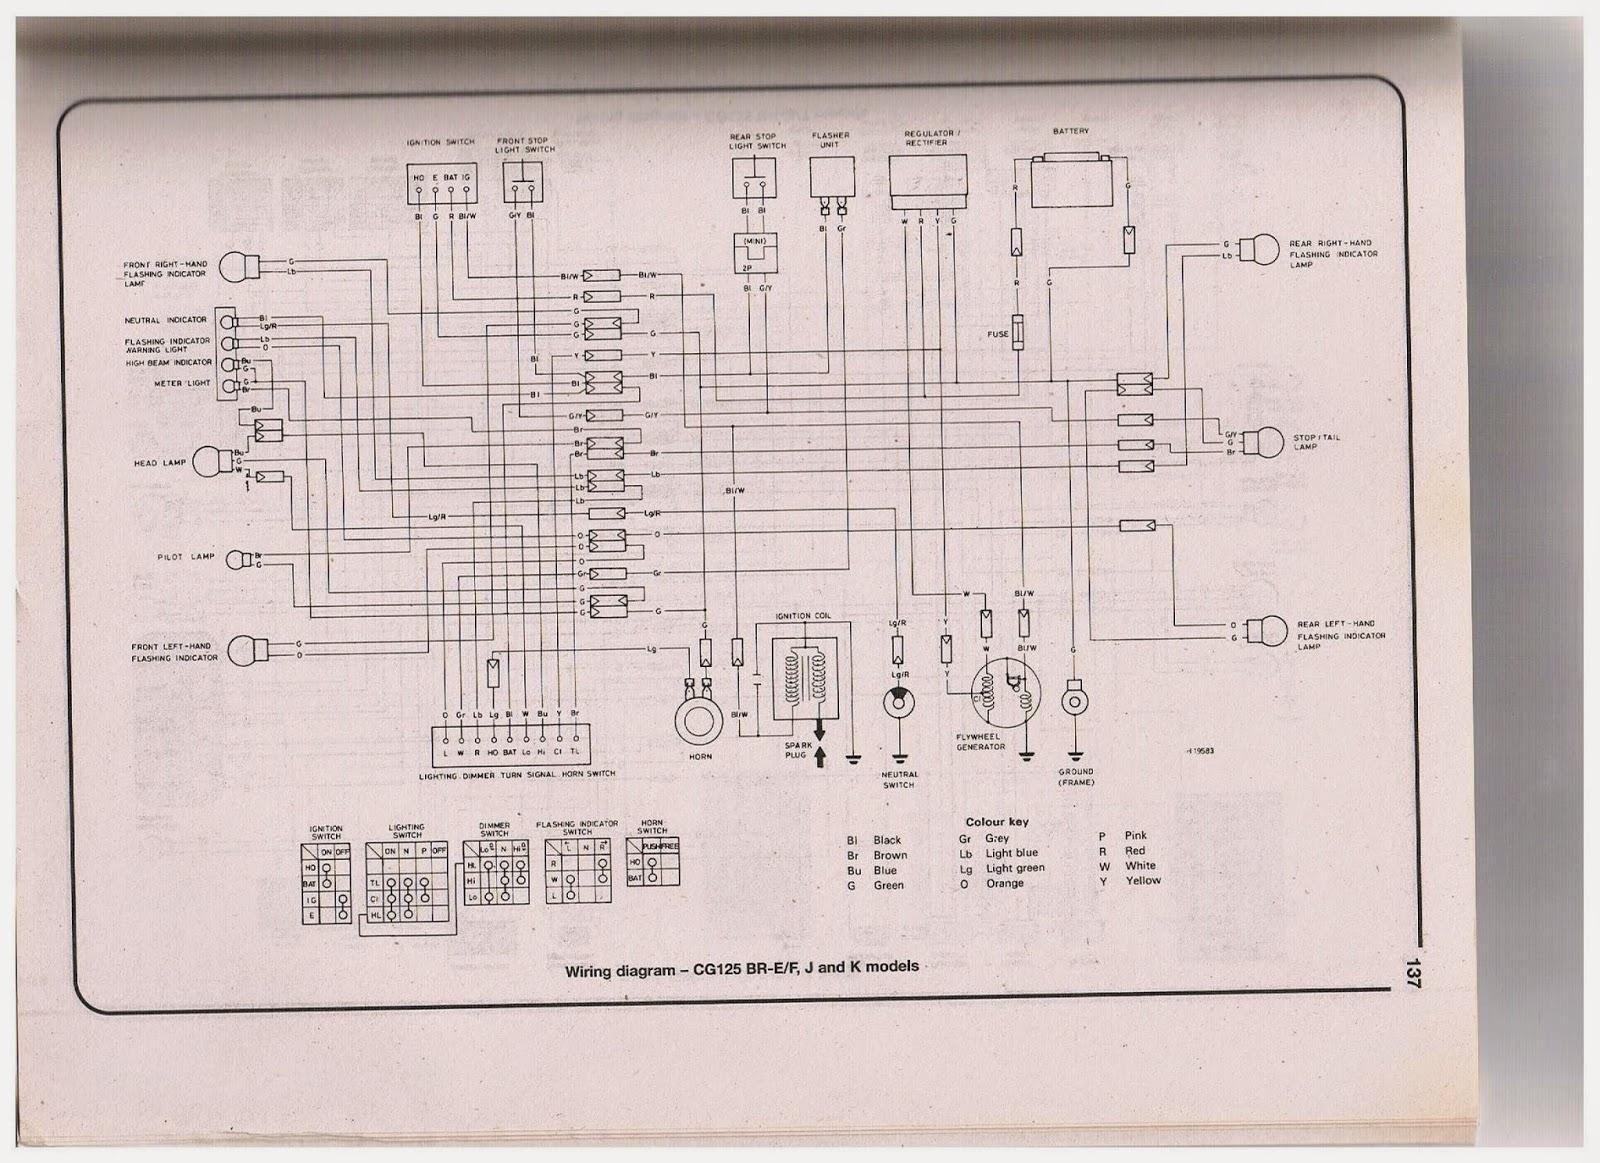 Honda Qr 50 Wiring Diagram Root Cause Analysis Tree Cg 125 Owner Blog Diagrams And